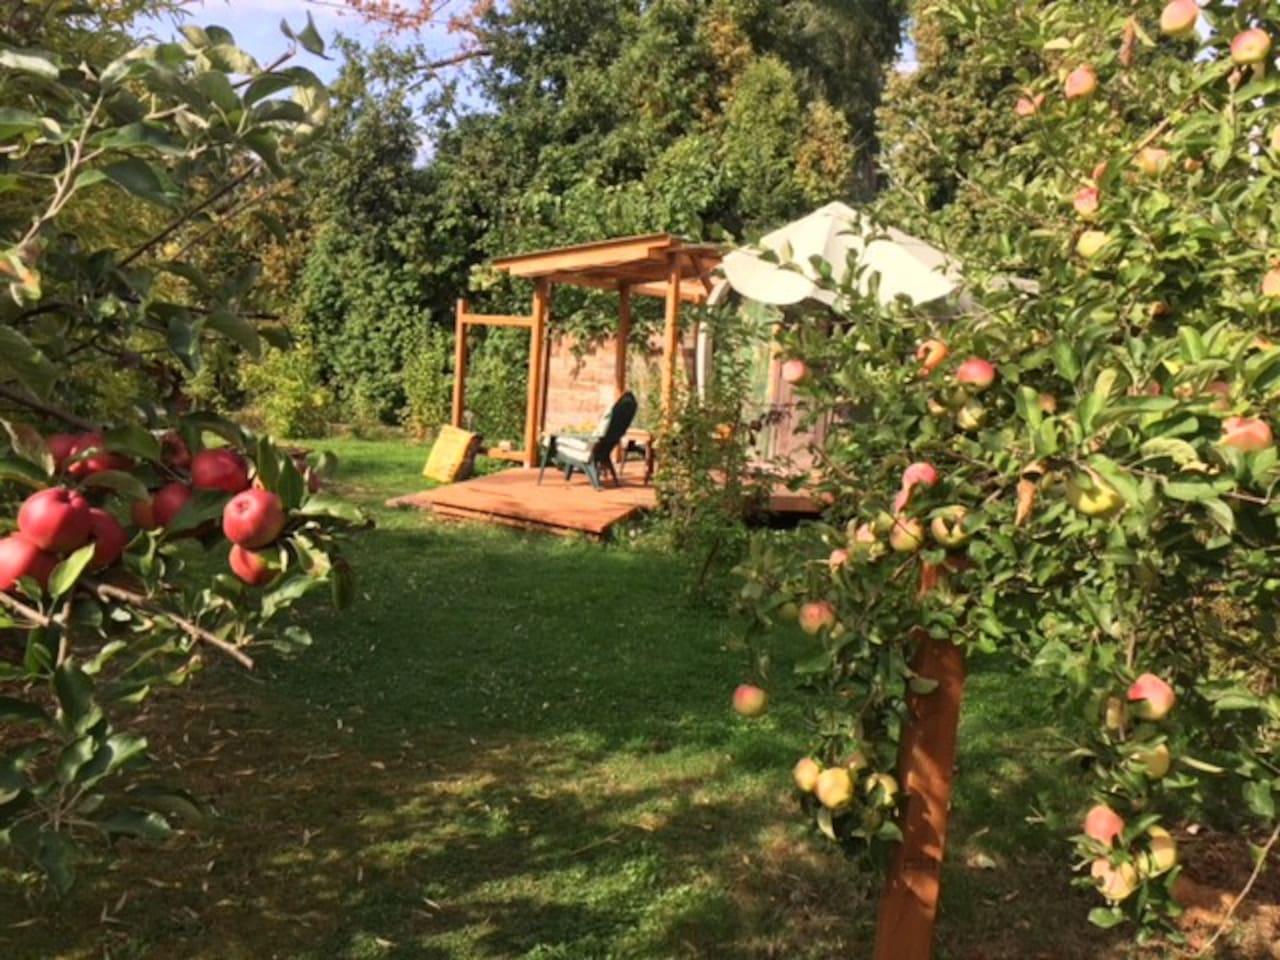 Gypsy Caravan in the apple trees